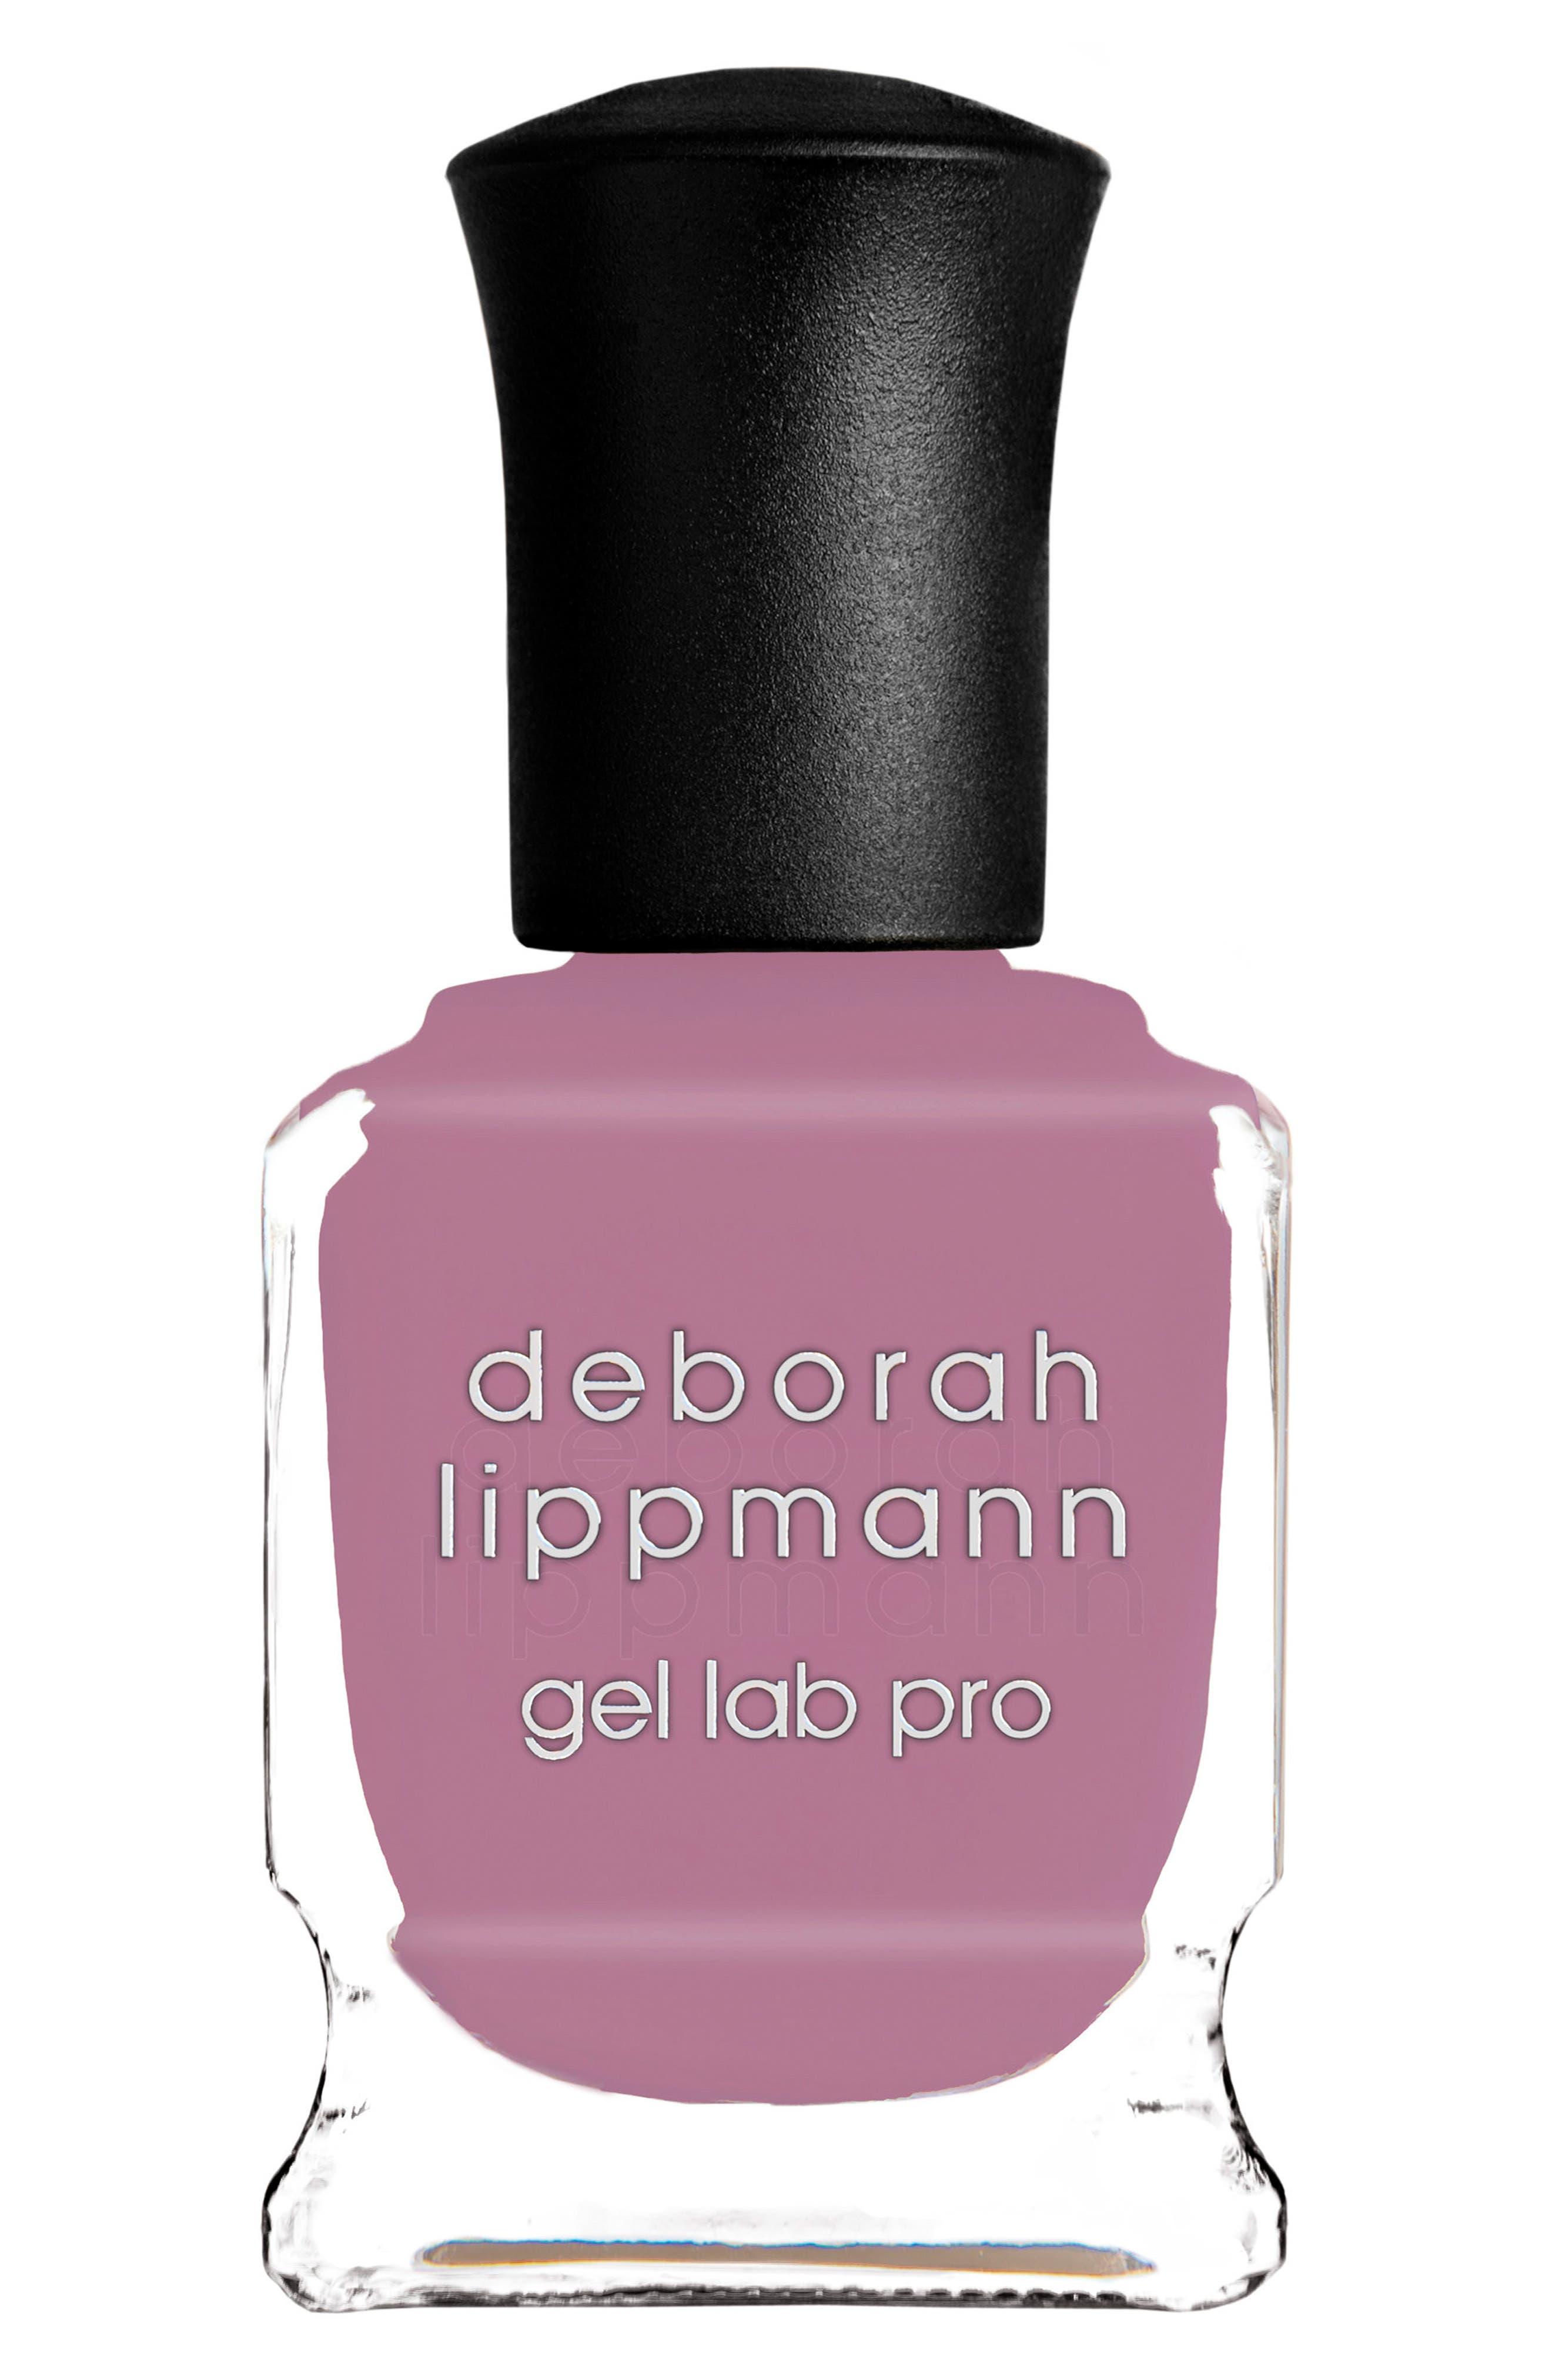 Deborah Lippmann Gel Lab Pro Nail Color (Nordstrom Exclusive)